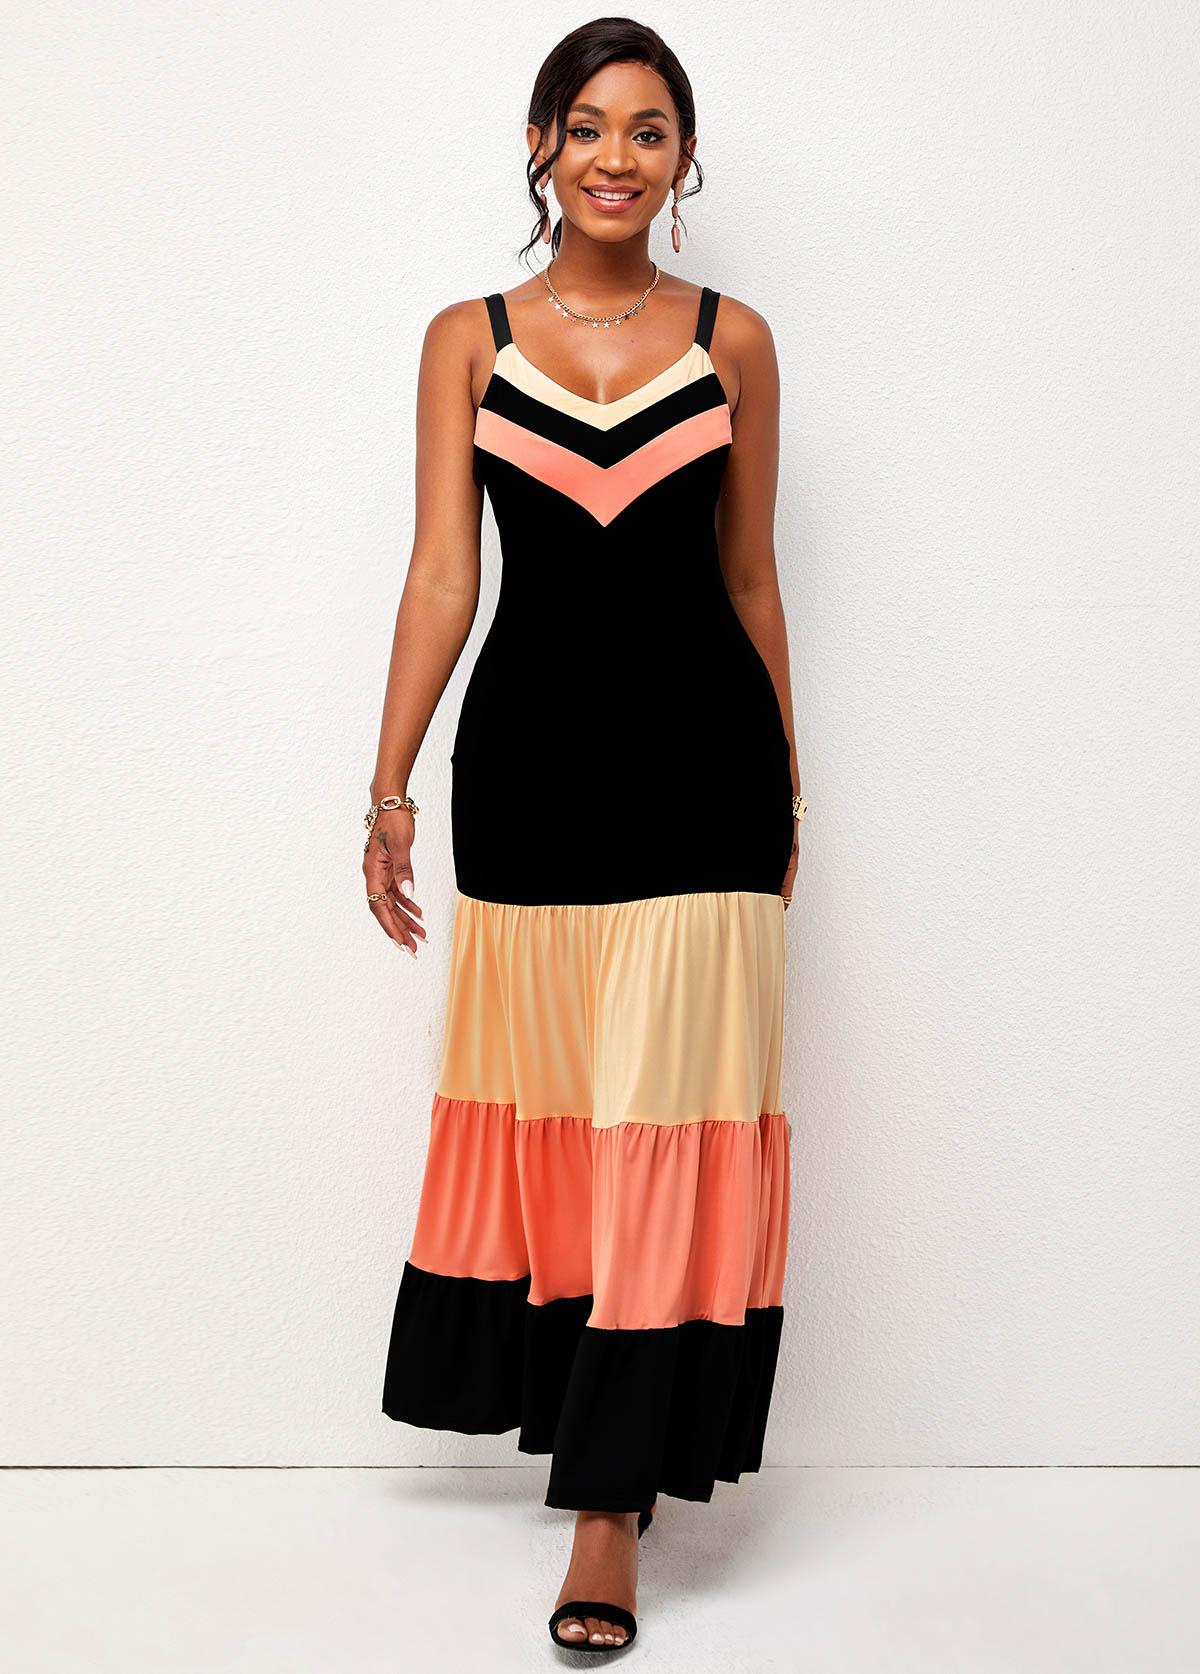 Chevron Print Wide Strap Contrast Dress